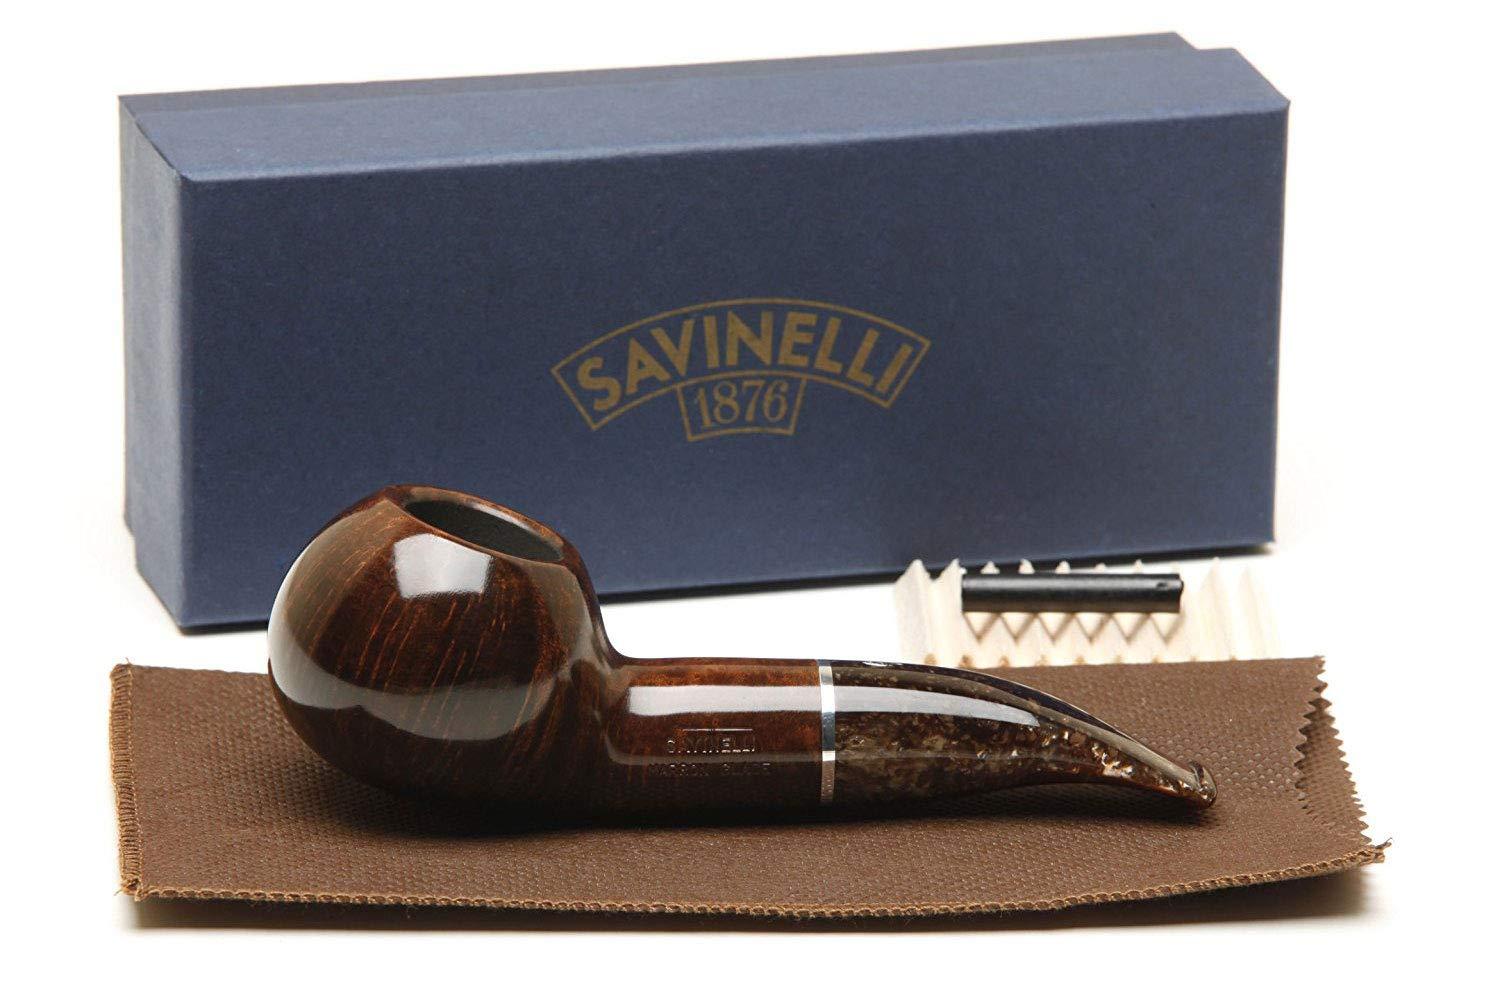 Savinelli Italian Tobacco Smoking Pipes, Marron Smooth 320 KS